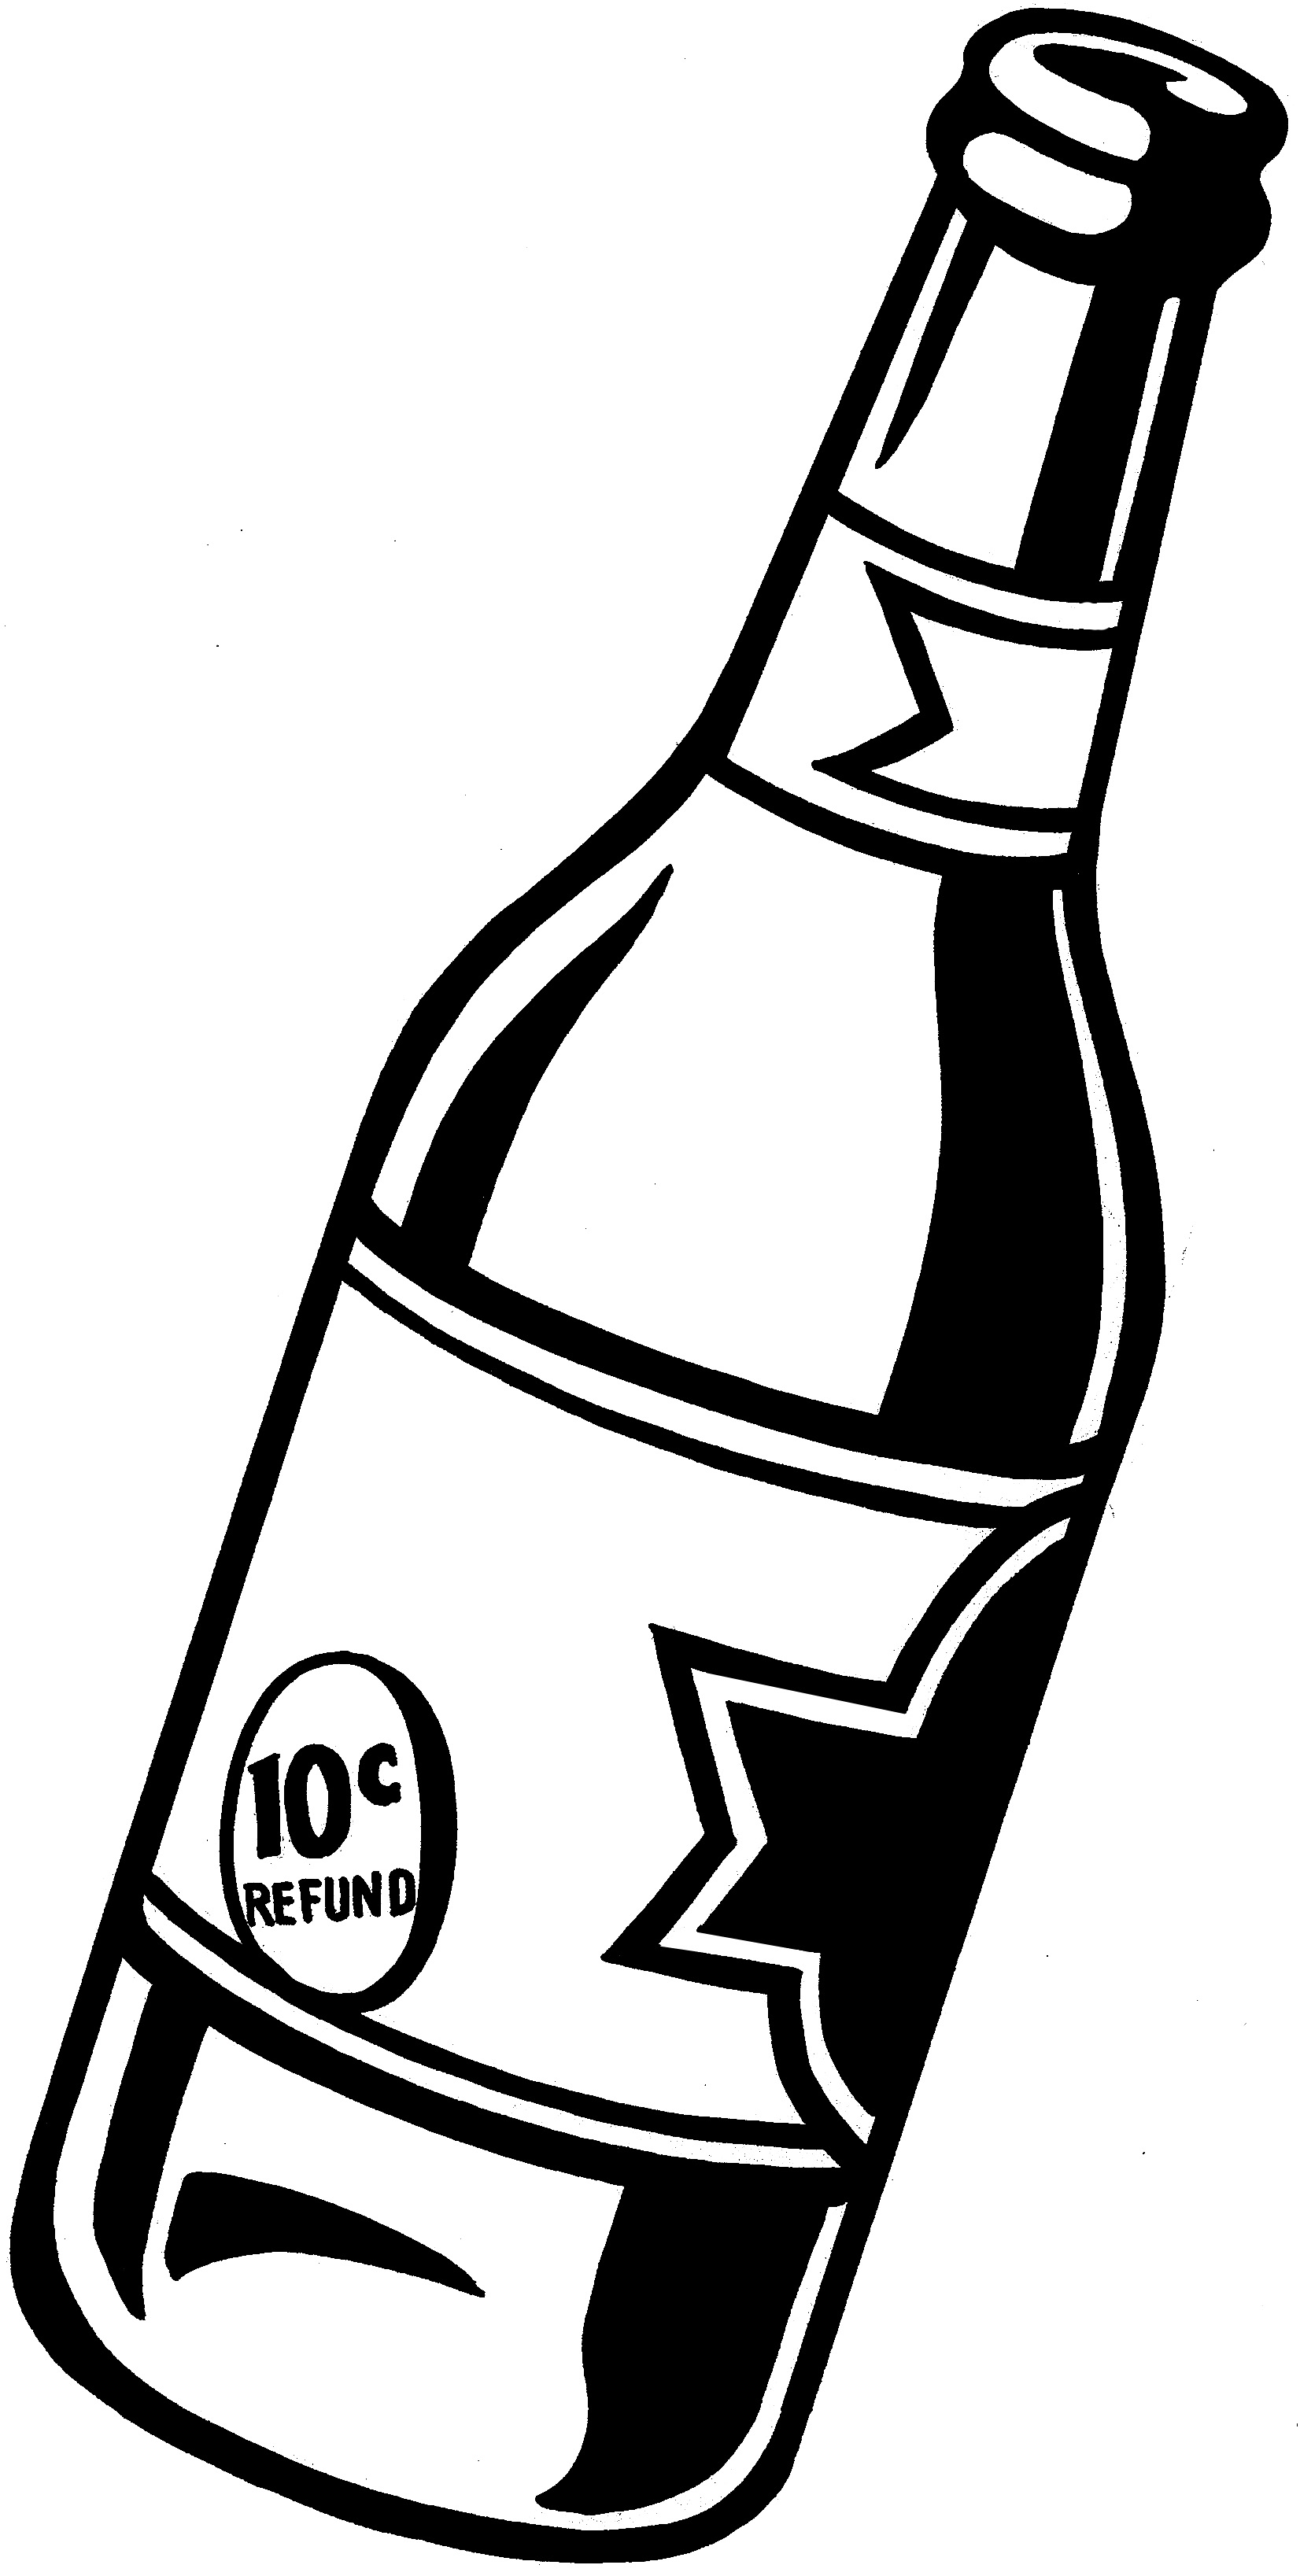 Beer Bottle Free Download Clip Art Free Clip Art